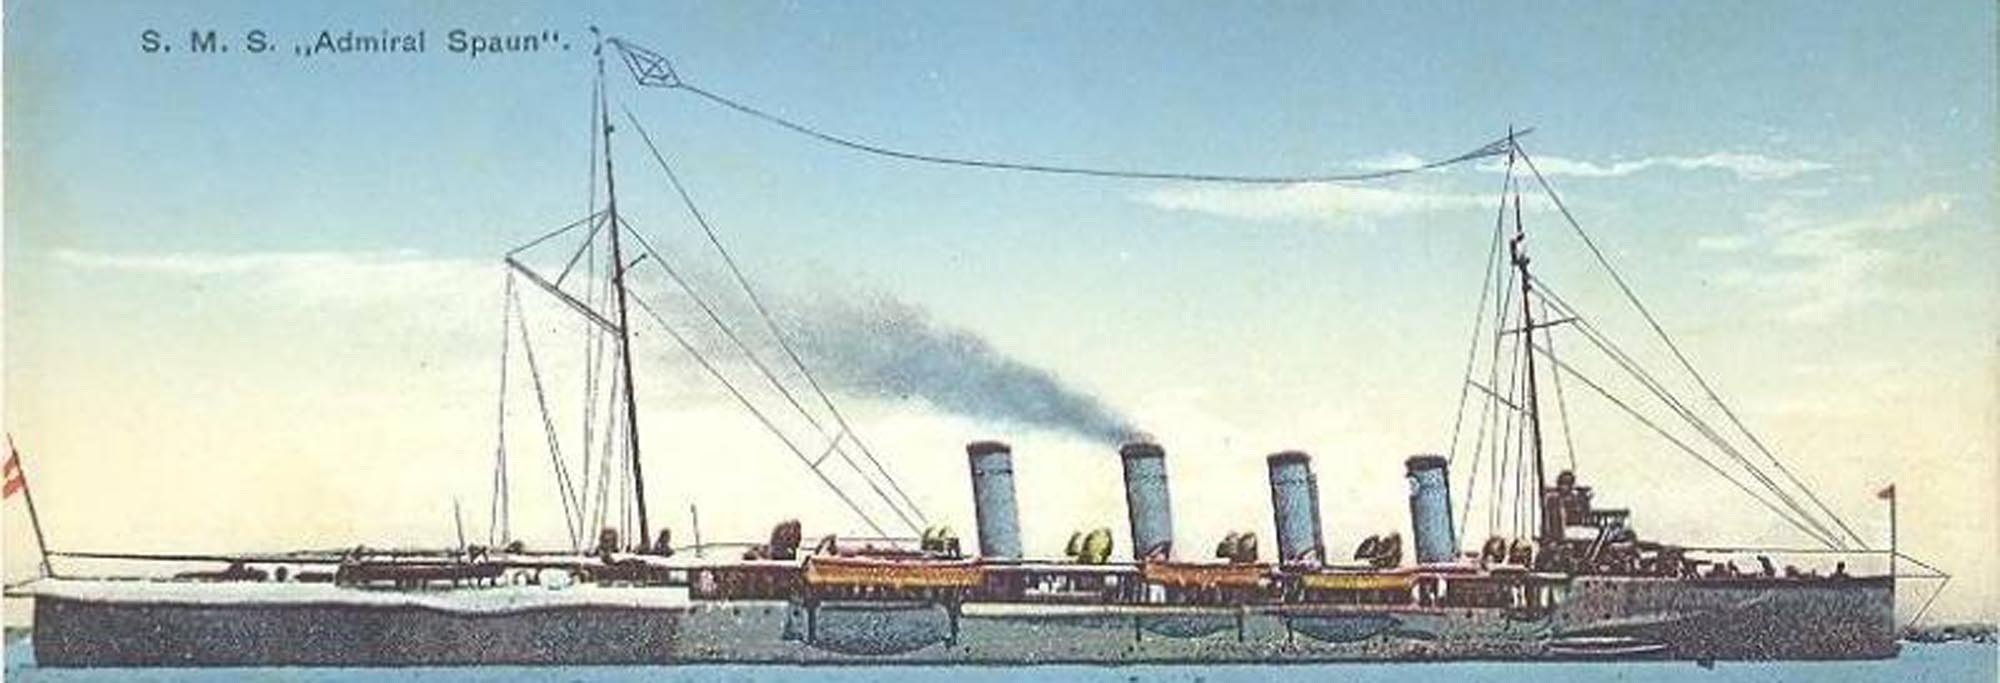 Admiral Spaun & Novara class cruisers